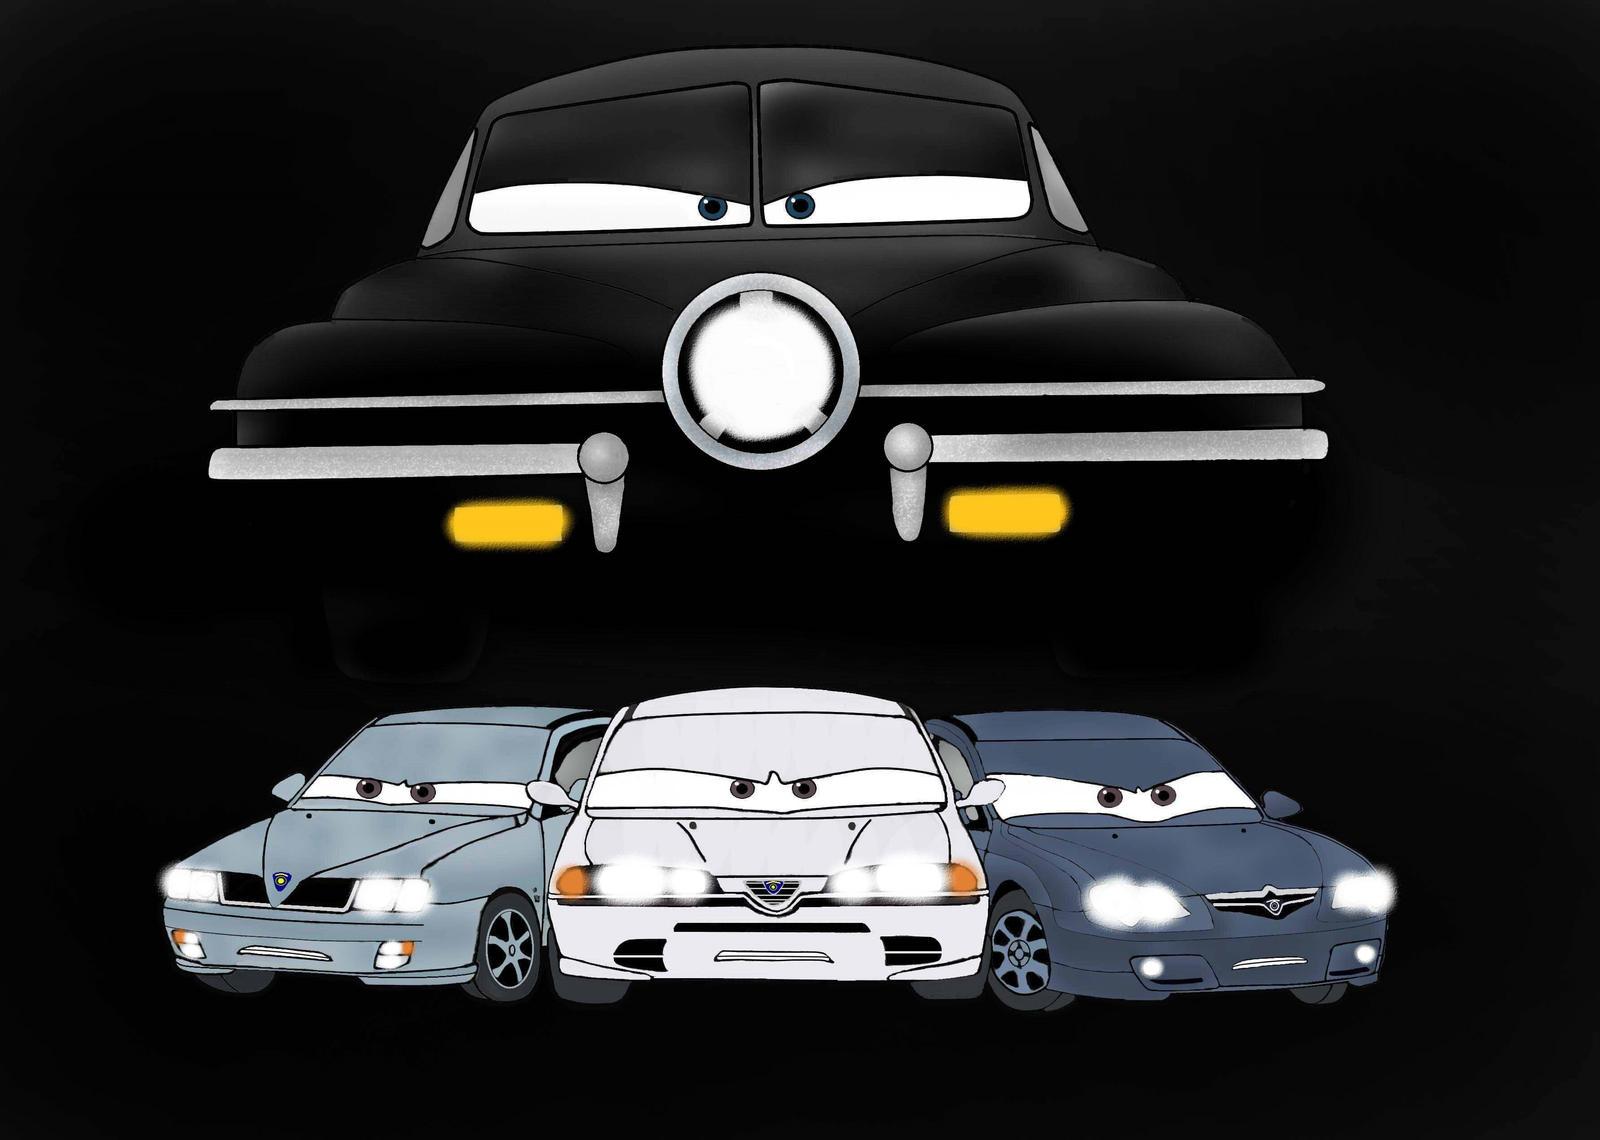 Персонажи Тачки 2 / Cars 2 | Авто фото | 1140x1600